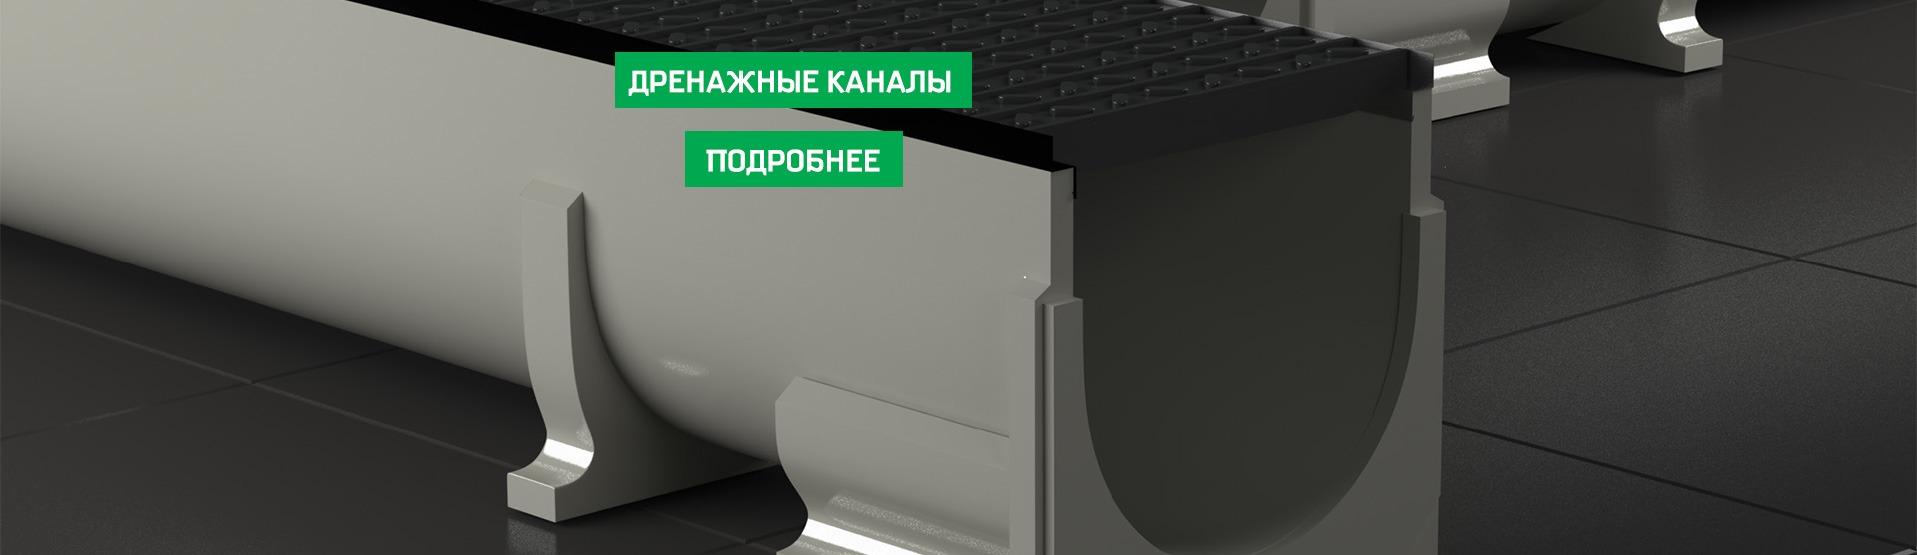 drenazne-ru